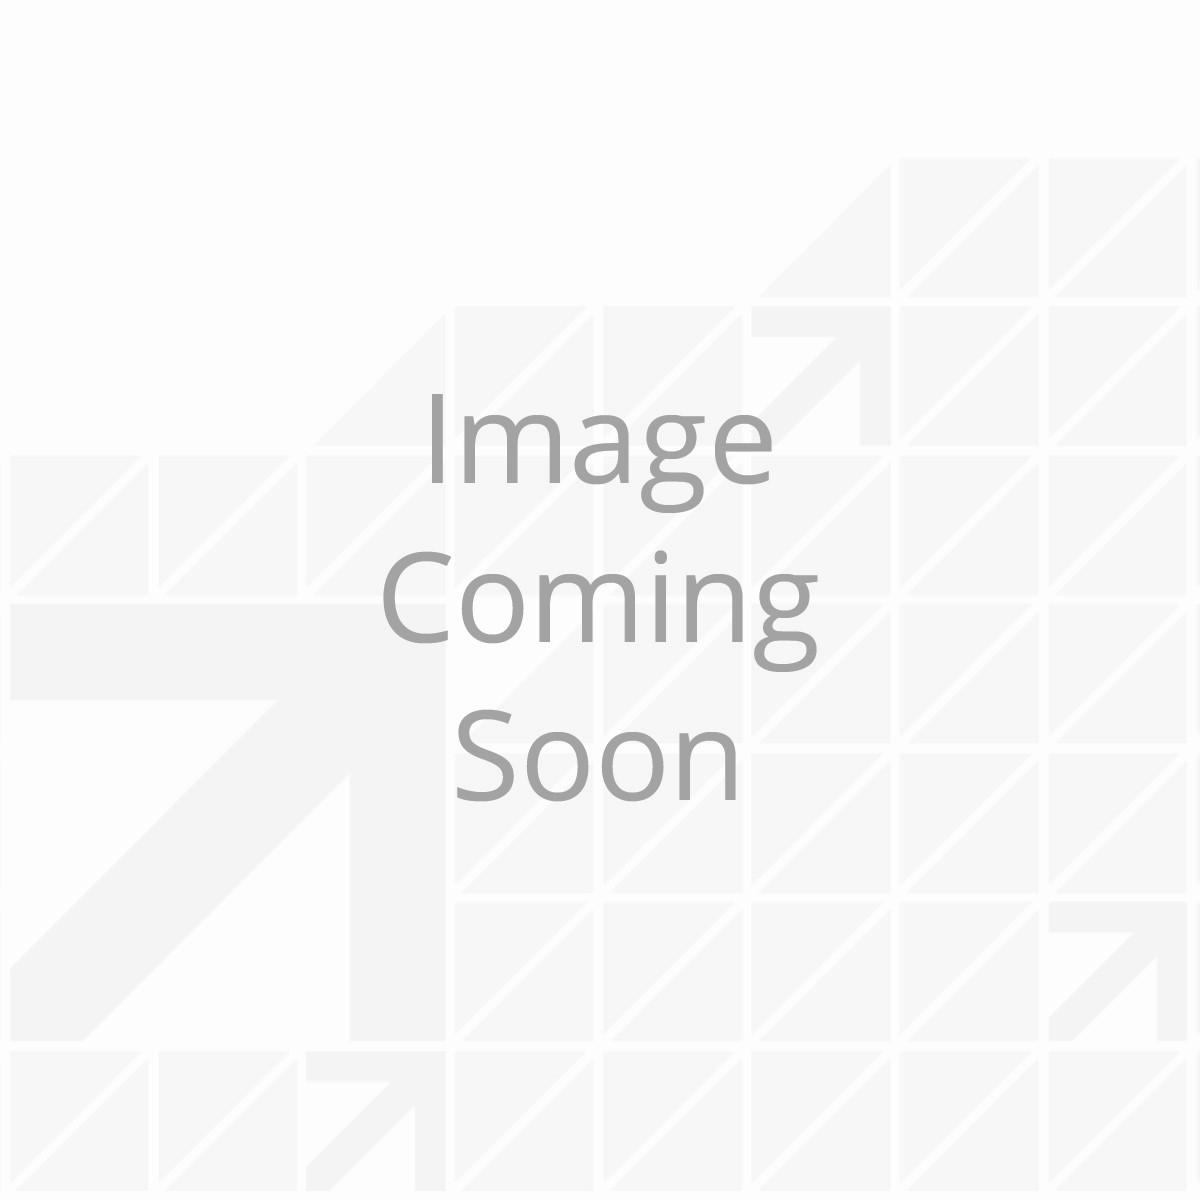 "Forward Self-Adjusting Brakes, 10"" x 2.25""; 3,500 lbs.- Left Side"